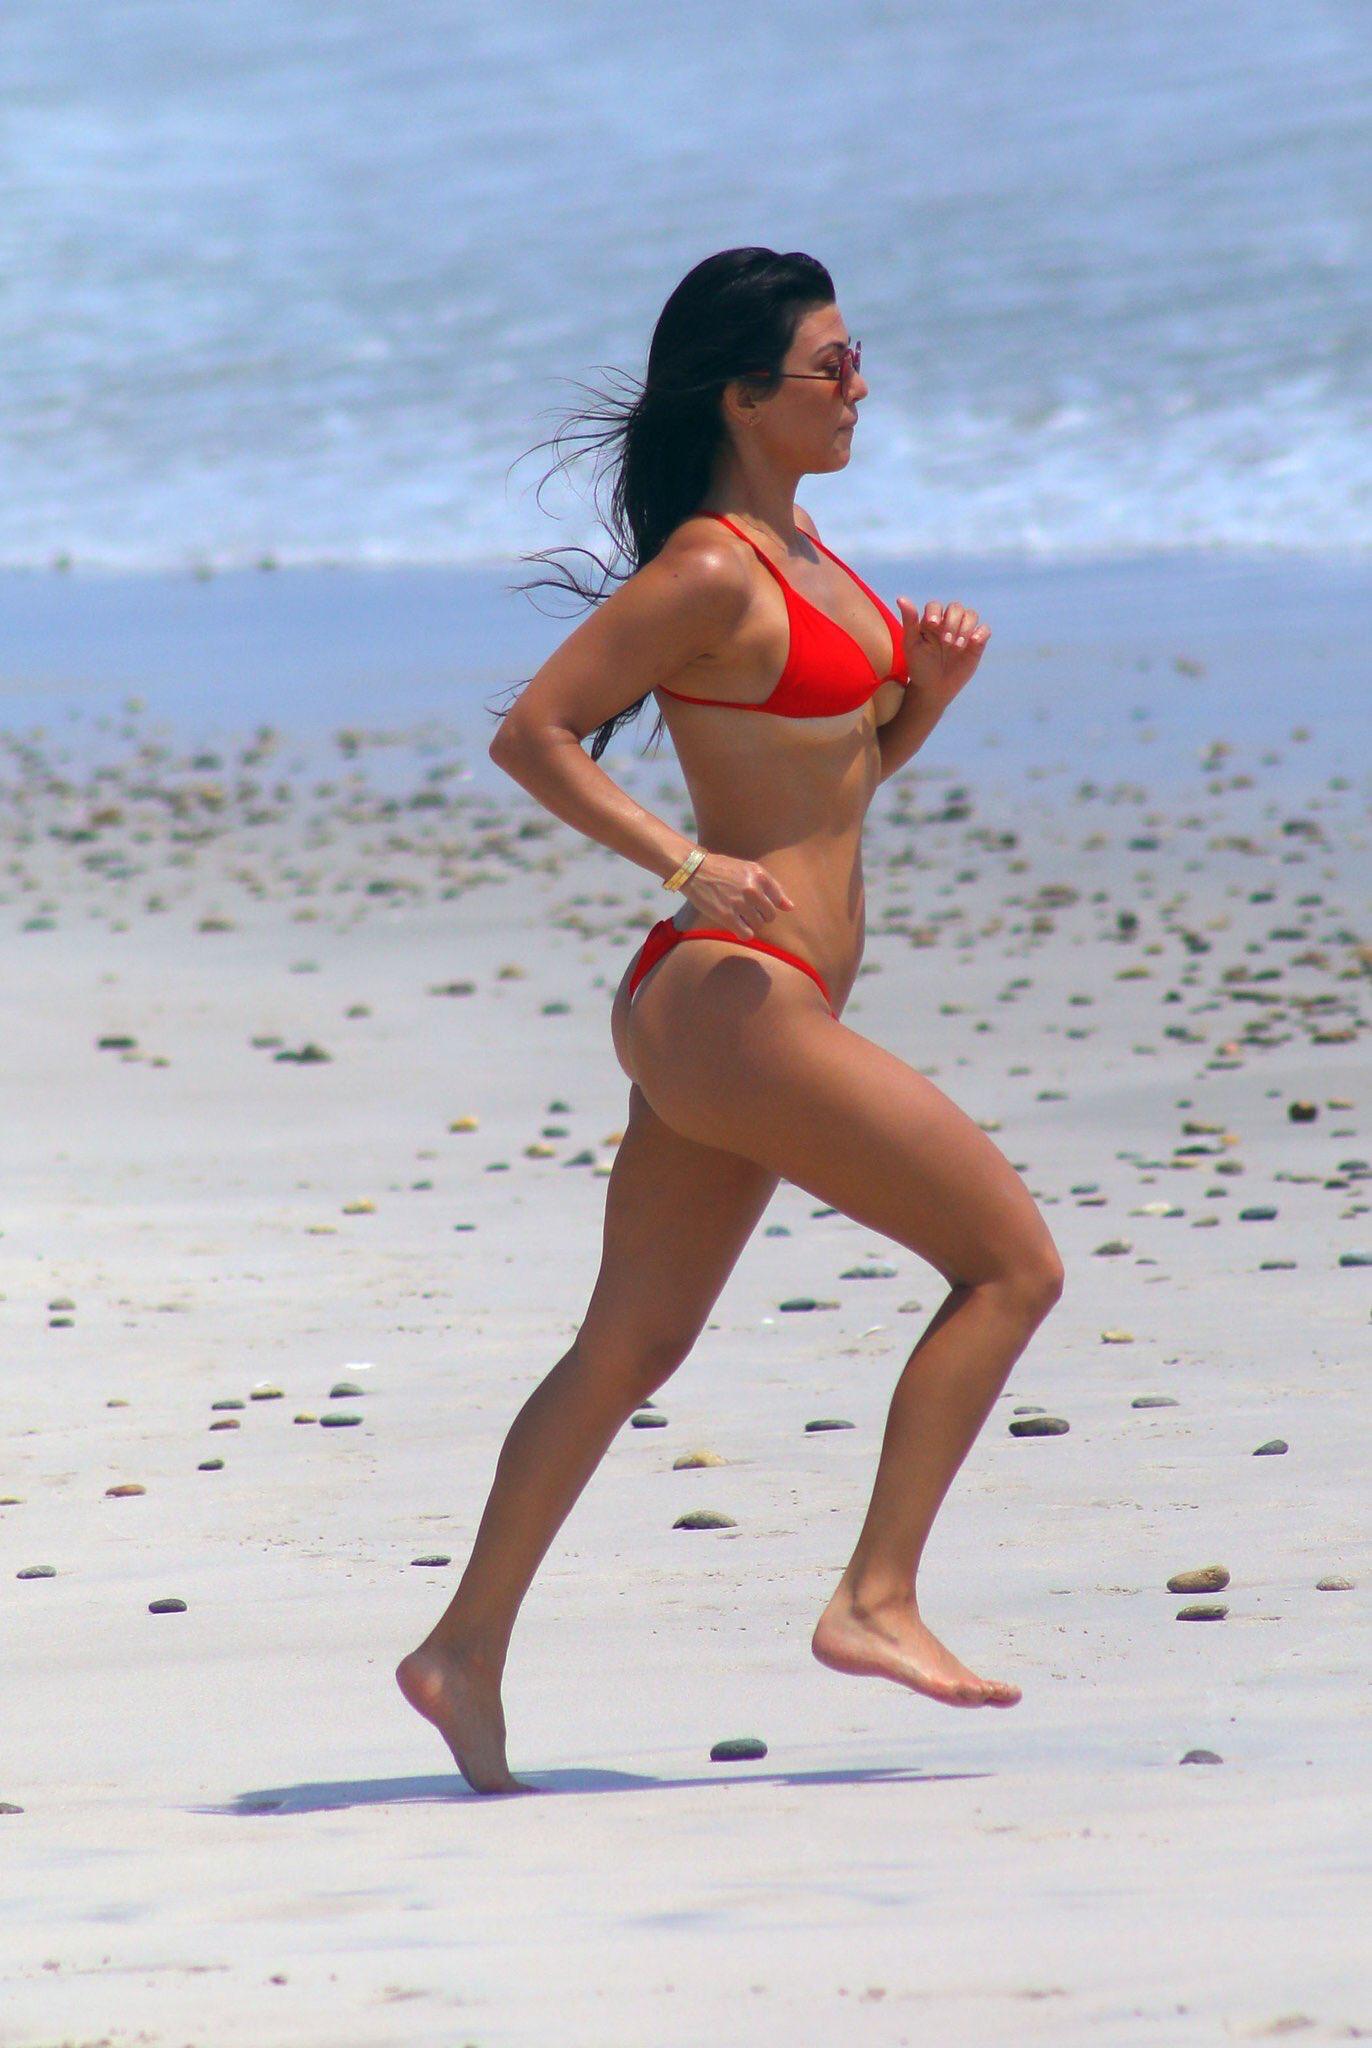 Kim perez glutes red bikini 9